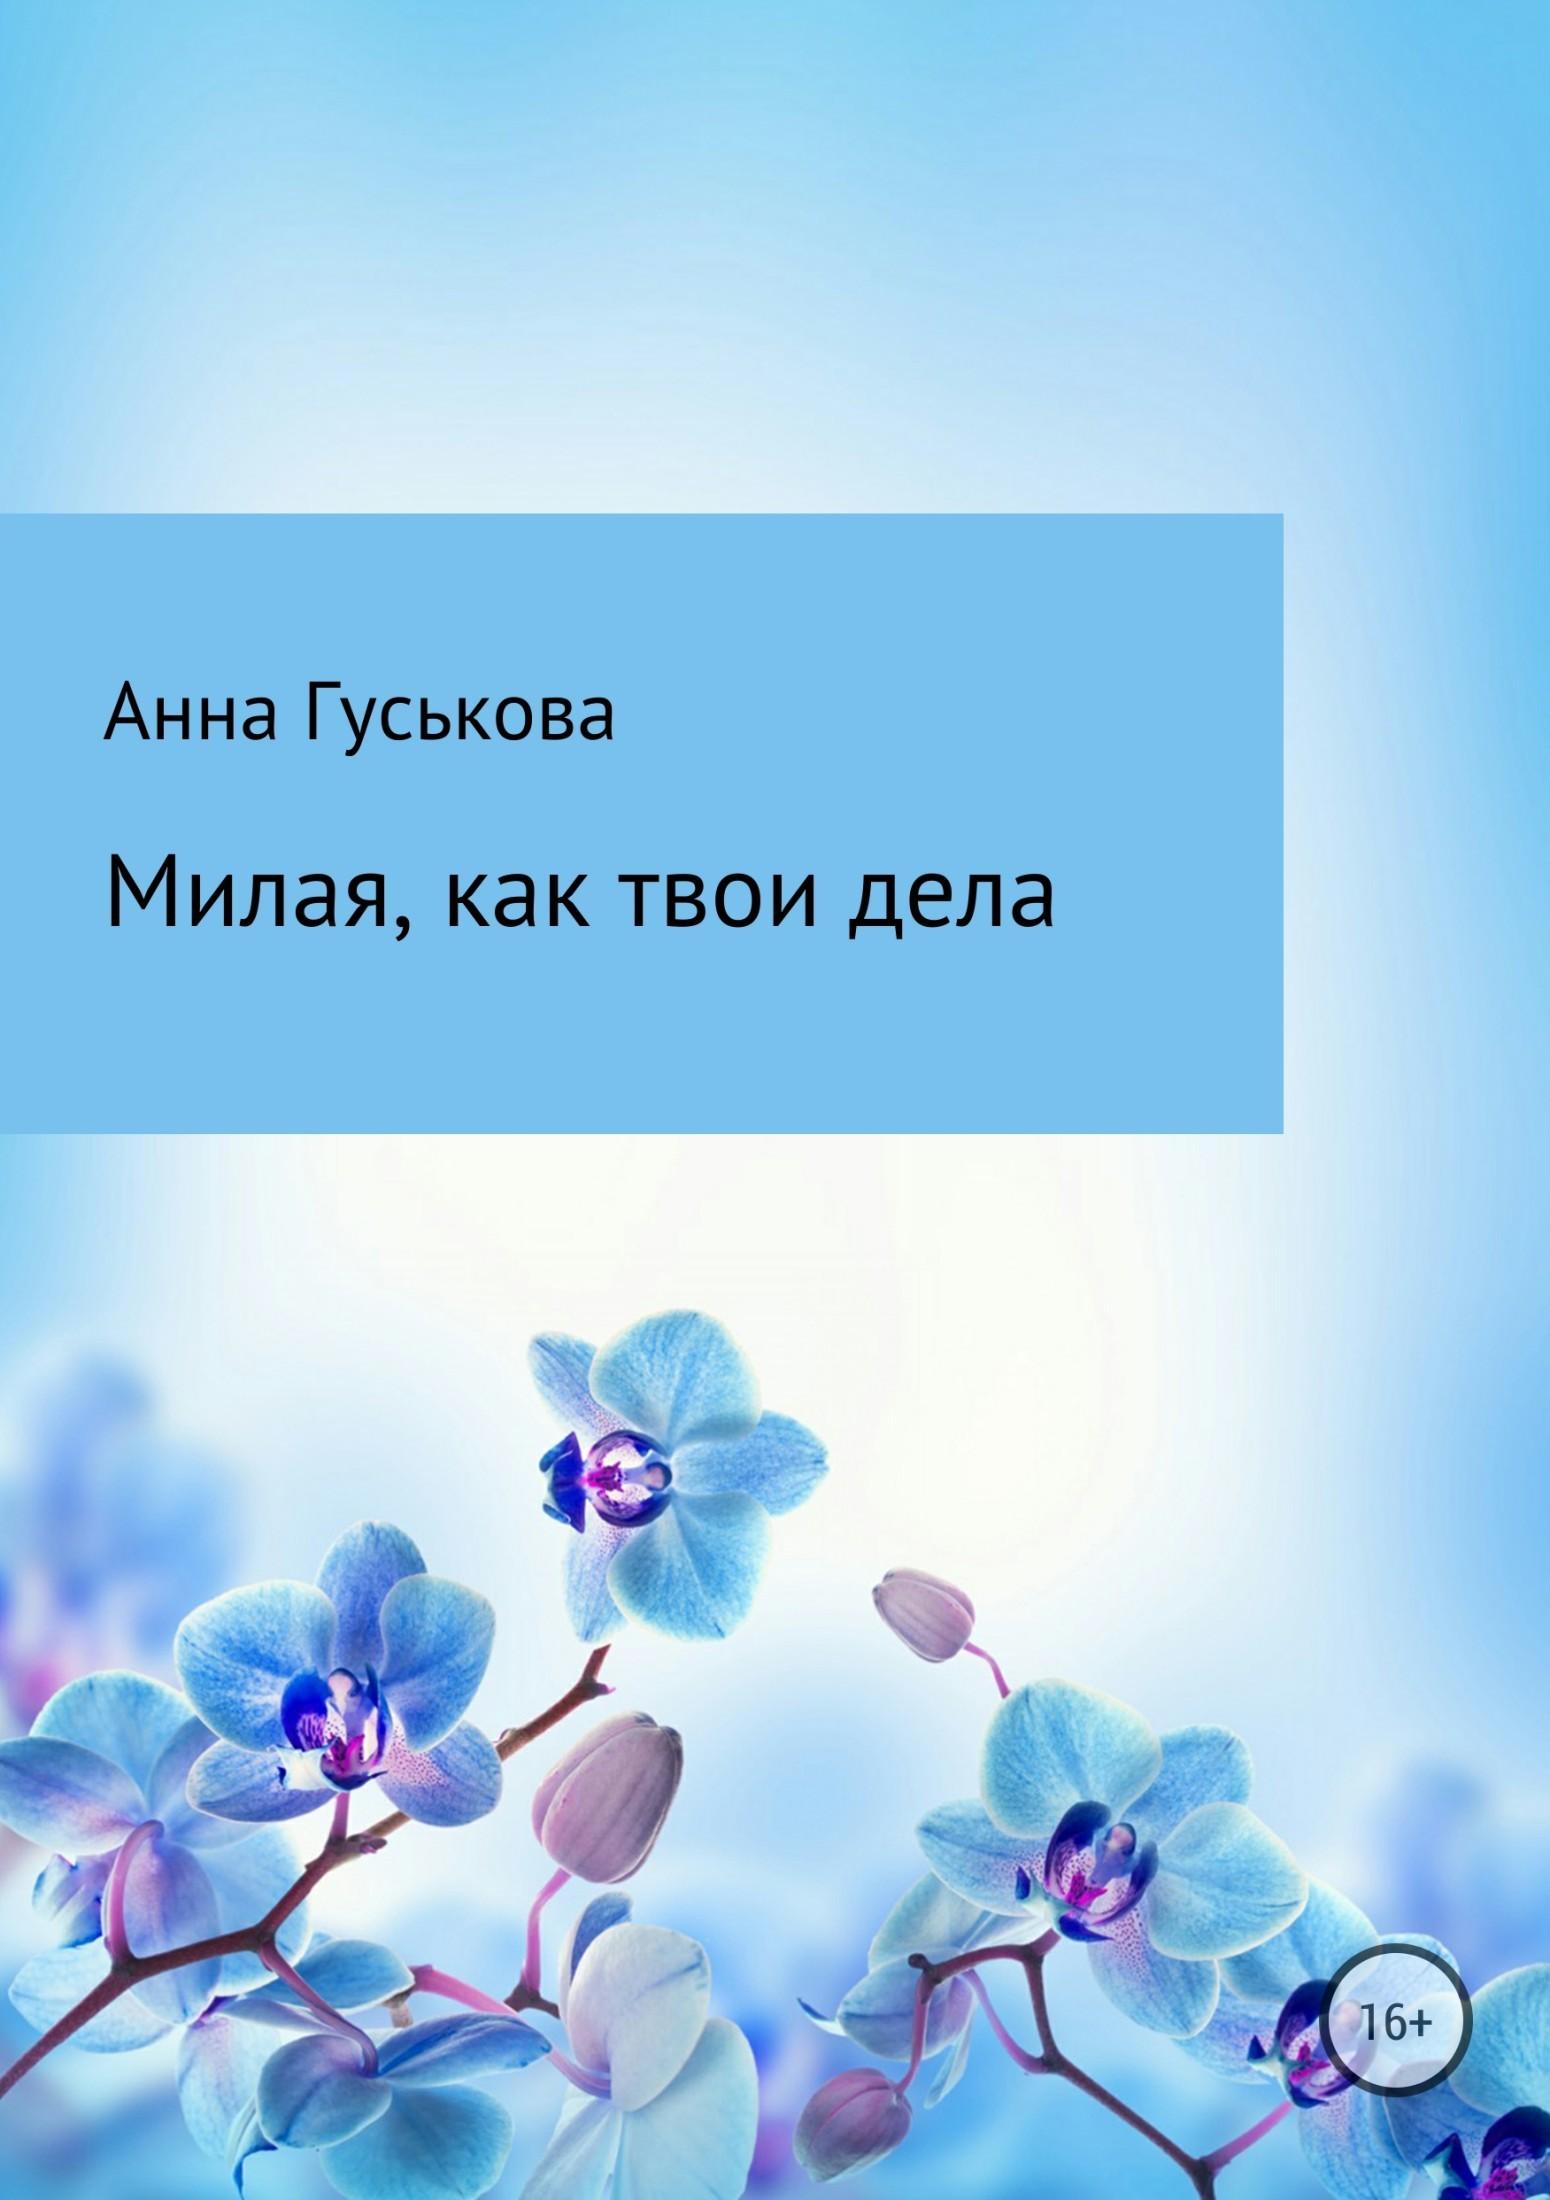 Анна Вячеславовна Гуськова Милая, как твои дела